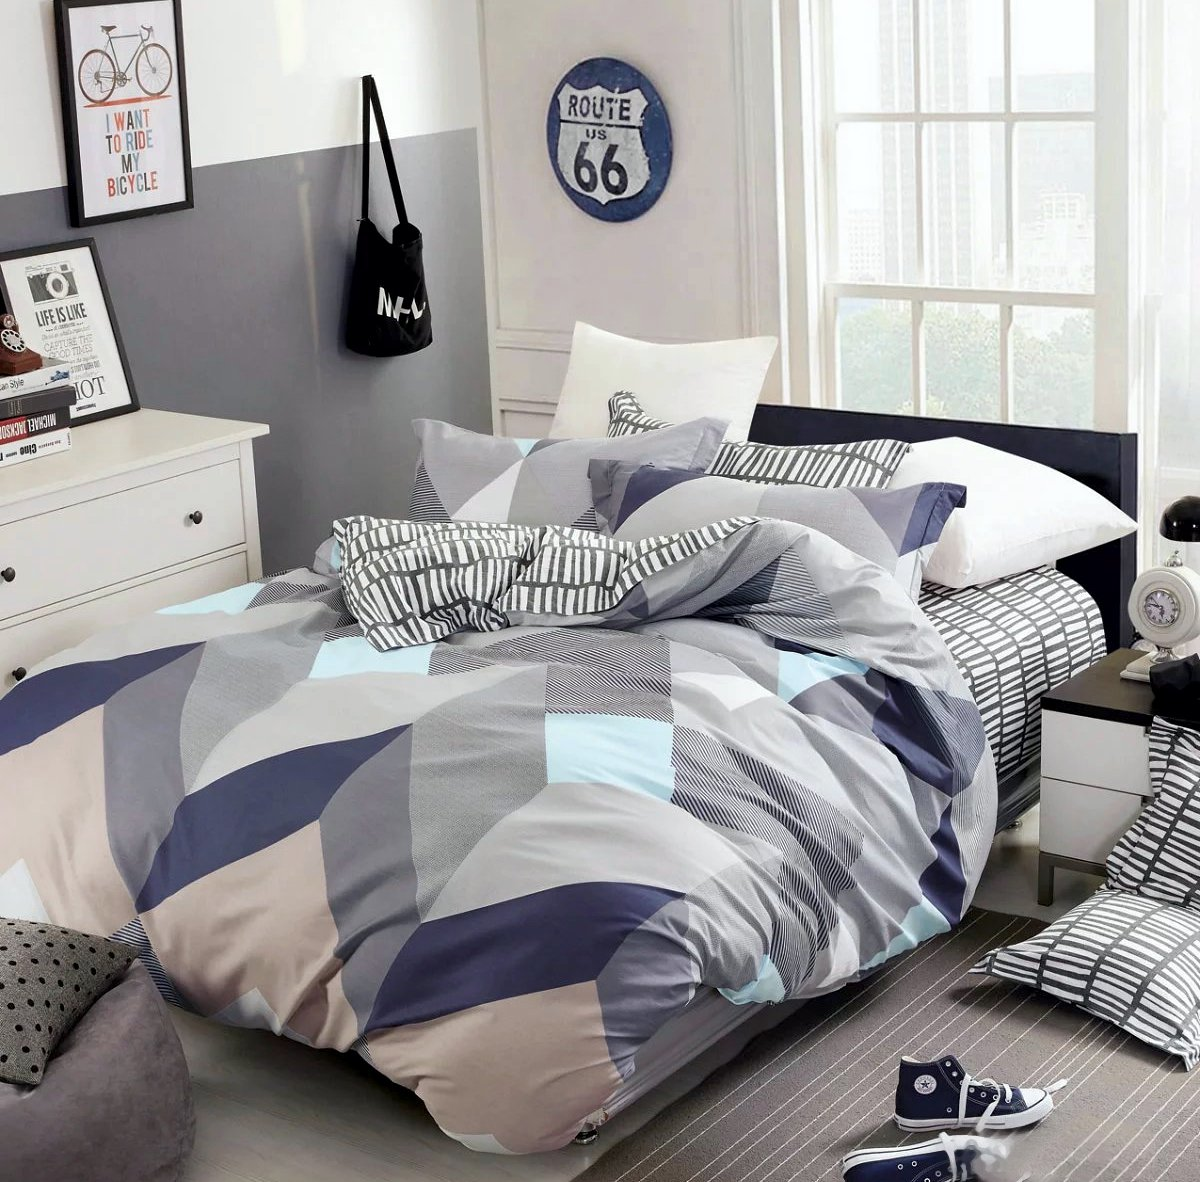 Eikei Home Minimal Style 几何形状被套 现代斯堪的纳维亚设计床上用品 * 纯棉柔软休闲双面方块印花三角图案 Mauve Sky Queen unknown